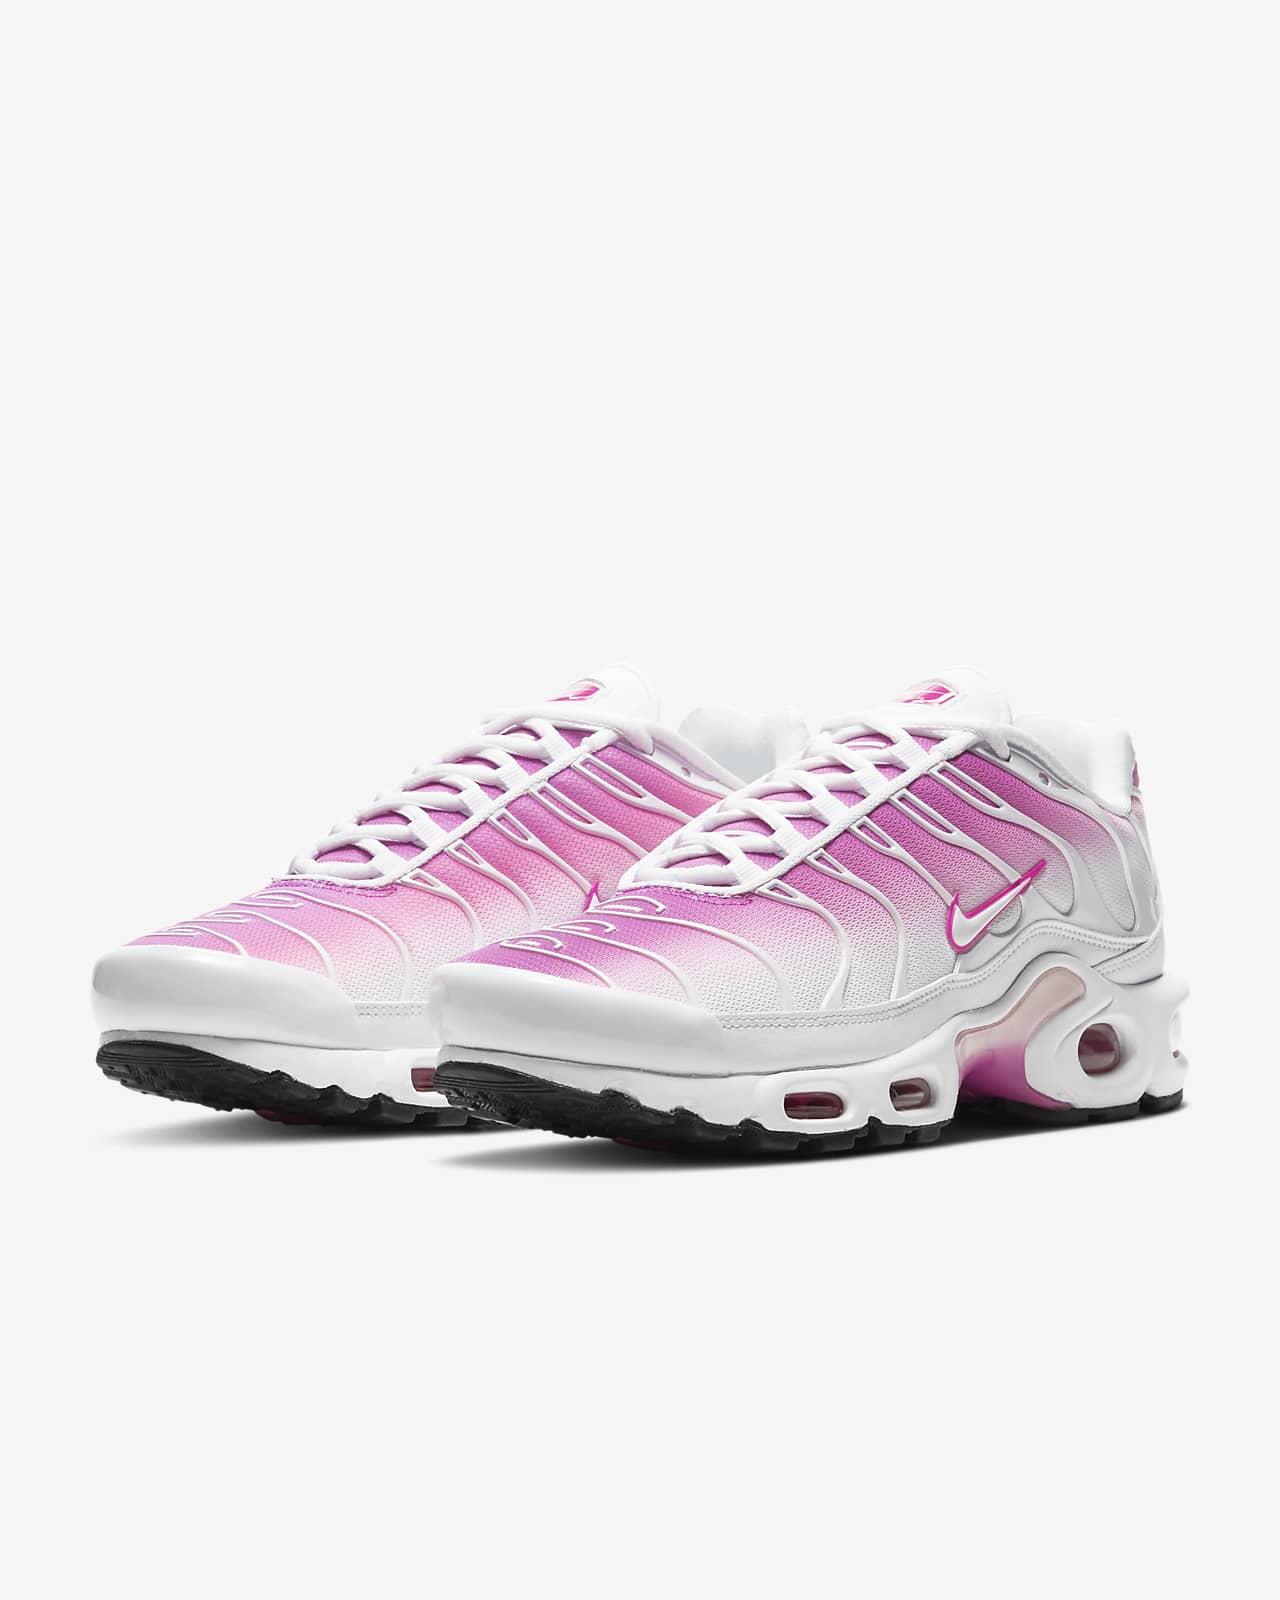 Nike Air Max Plus Women's Shoe. Nike SA